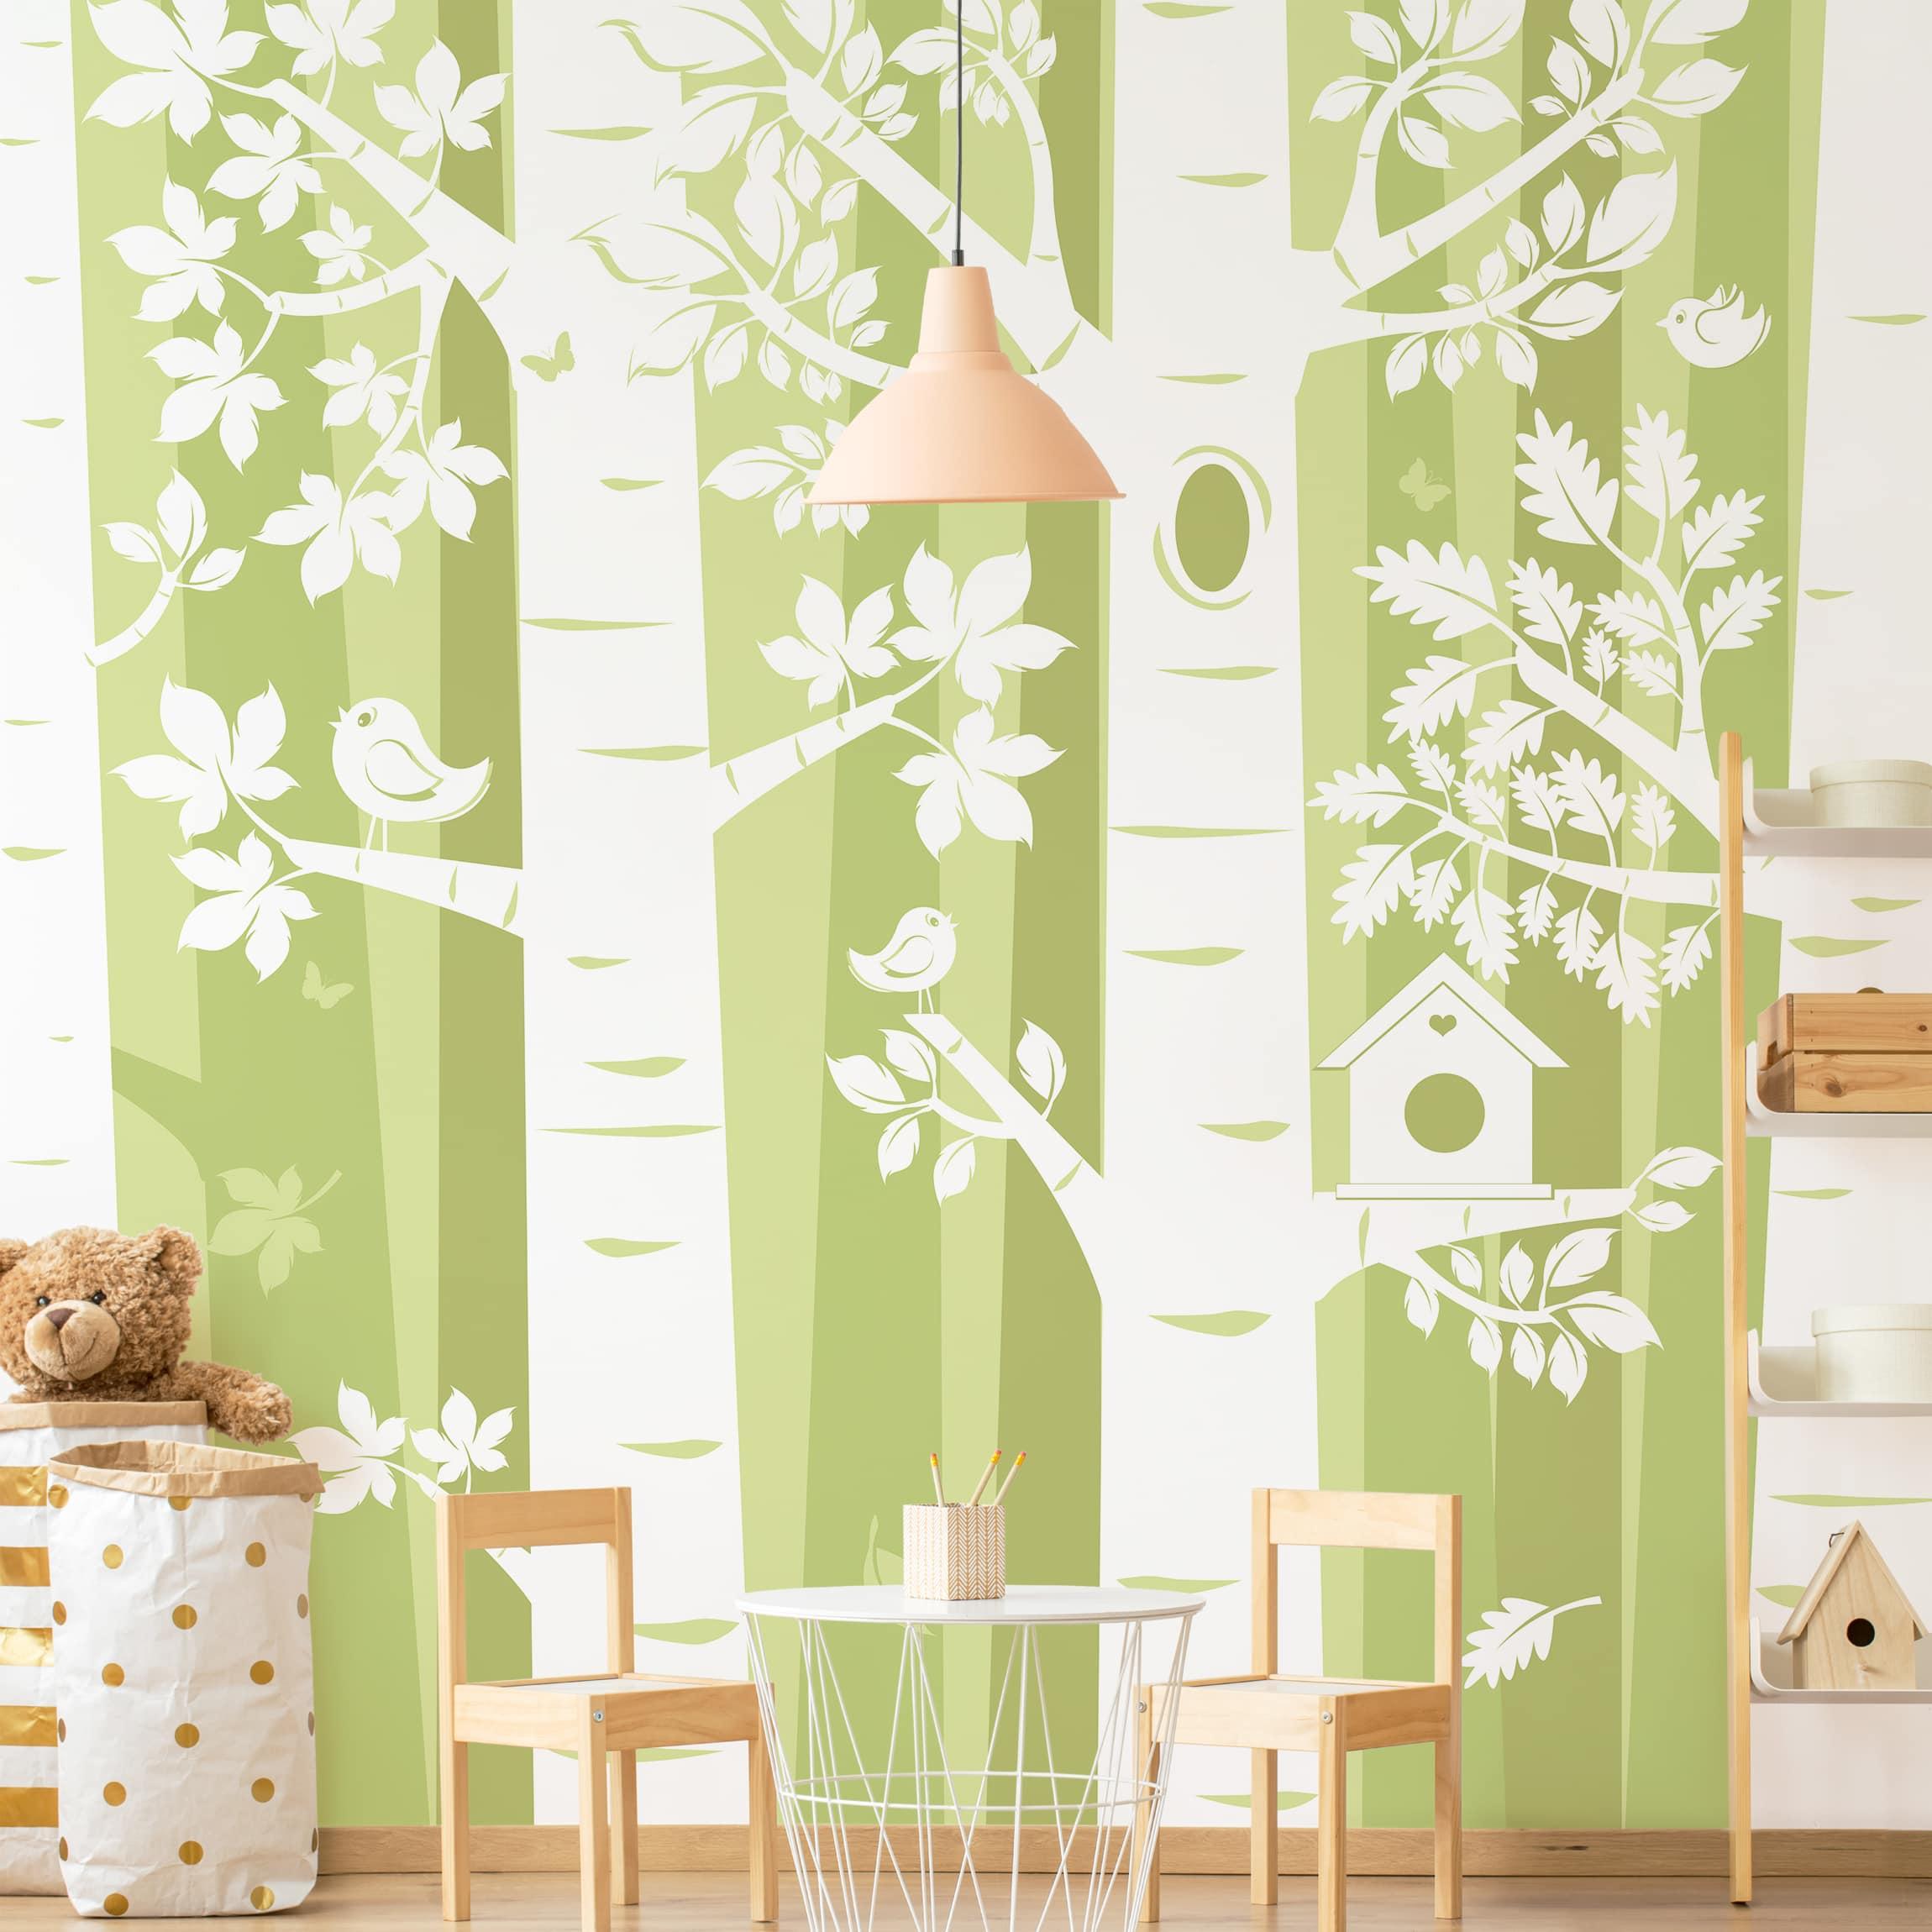 Selbstklebende Tapete Kinderzimmer - Bäume im Wald Grün - Fototapete Quadrat